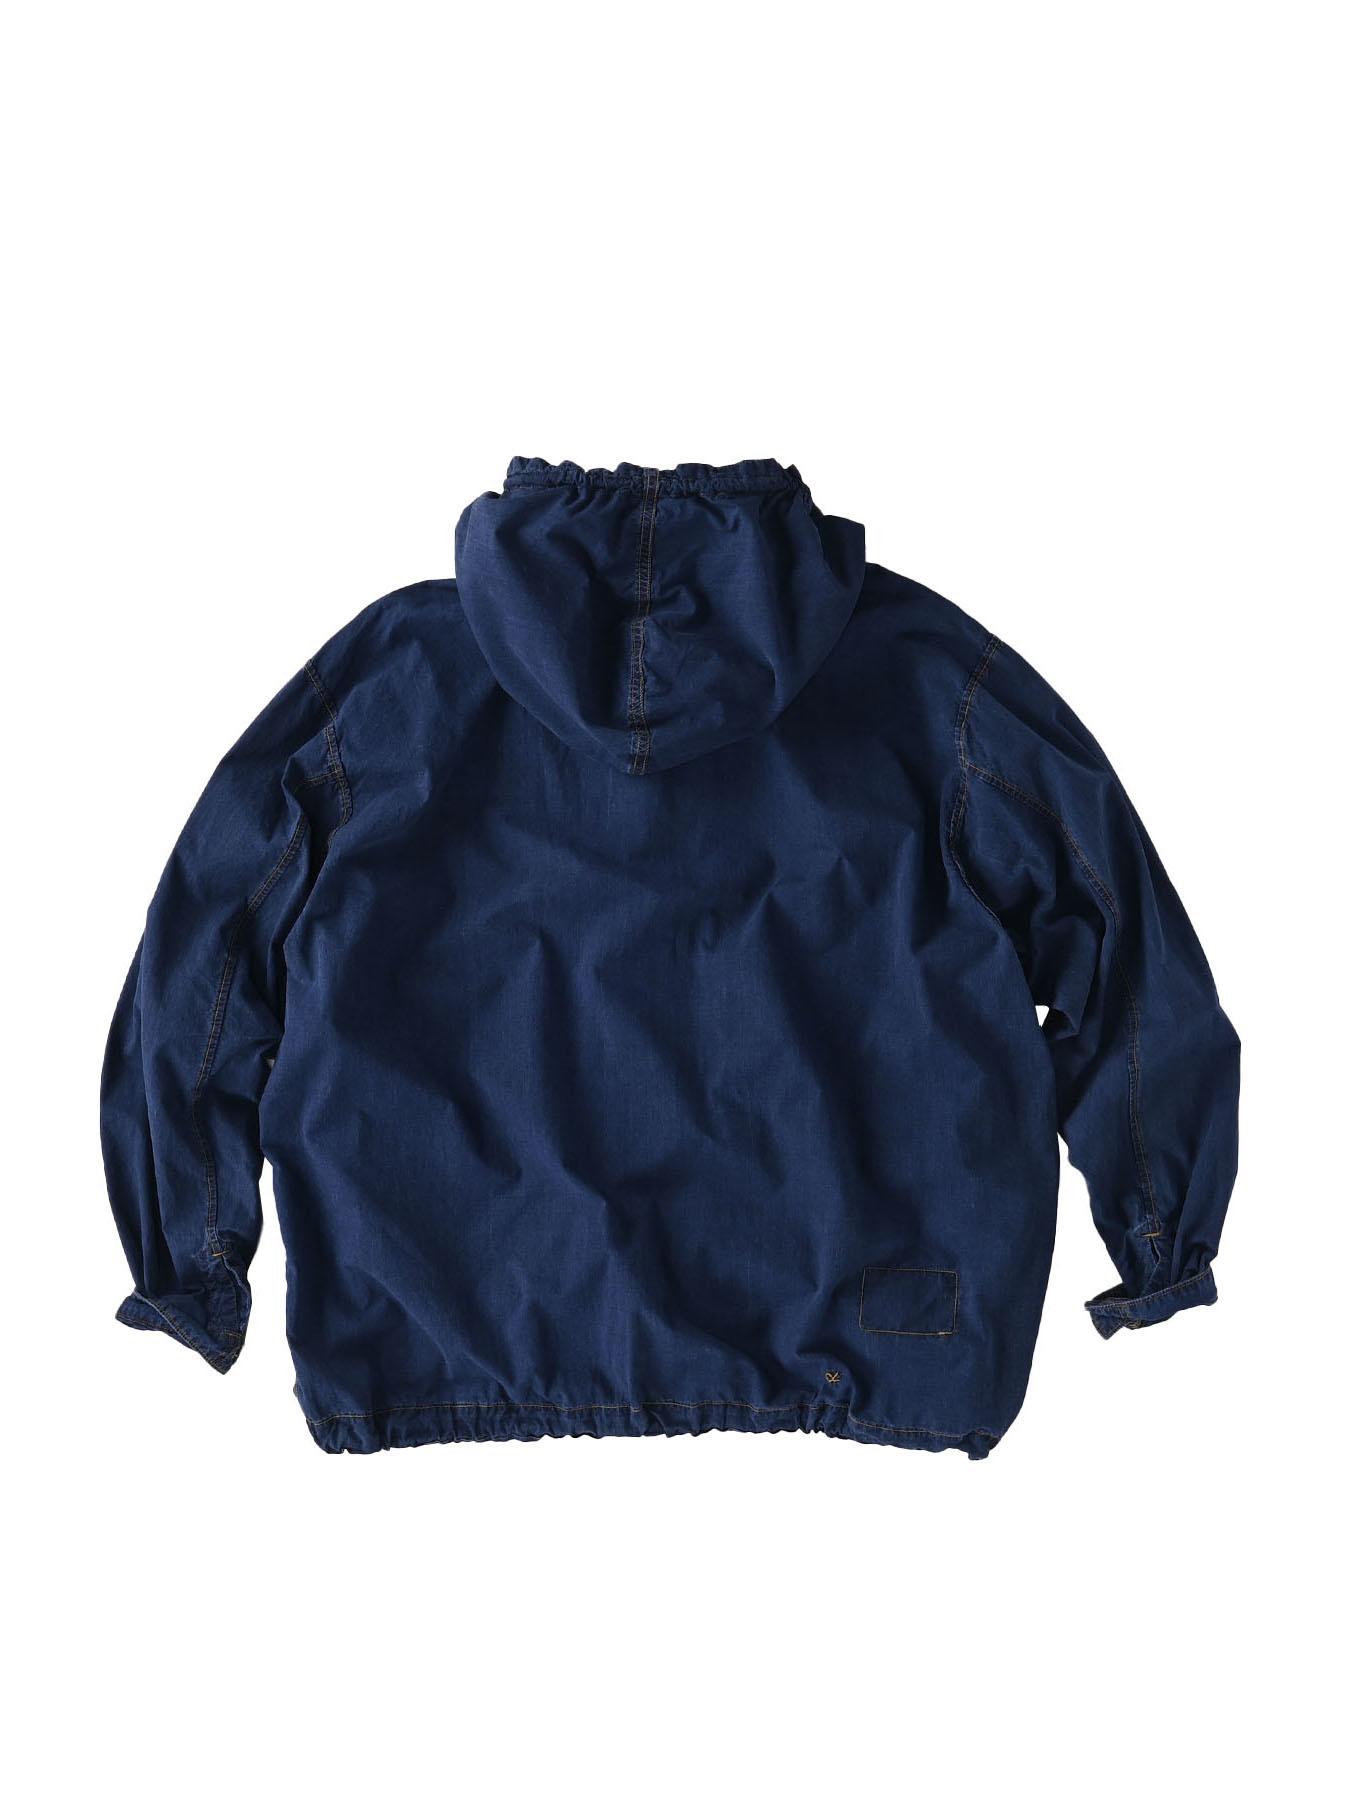 Indigo Tapet Damo Cotton On The Beach Hoodie Shirt-10